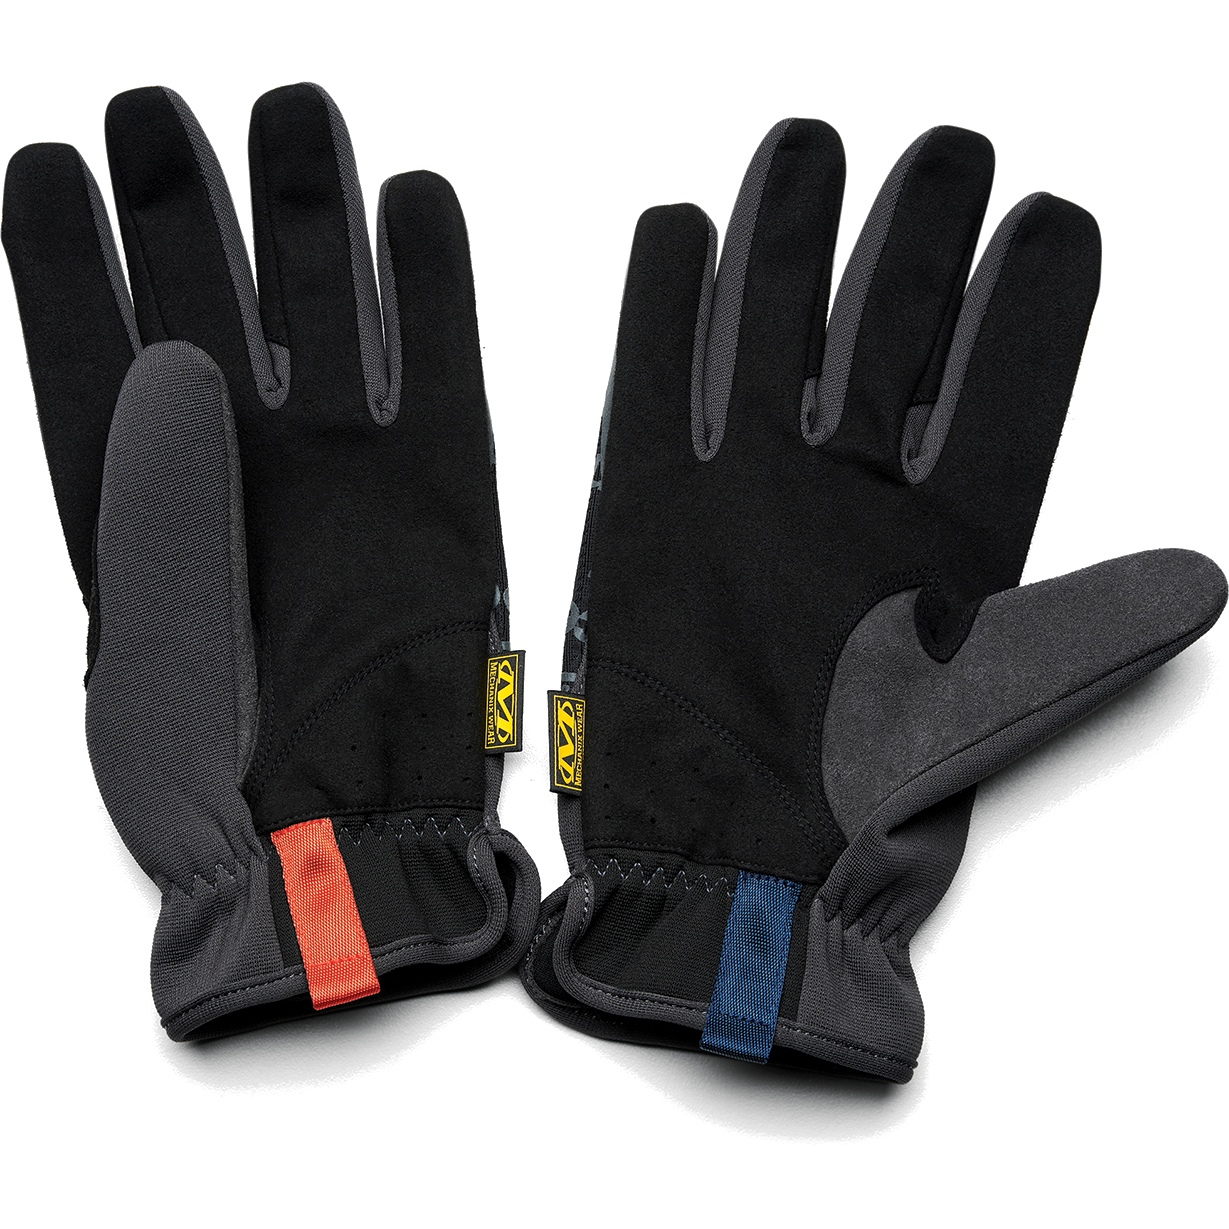 Imagen de 100% Mechanix Wear FastFit Guantes de Taller - black